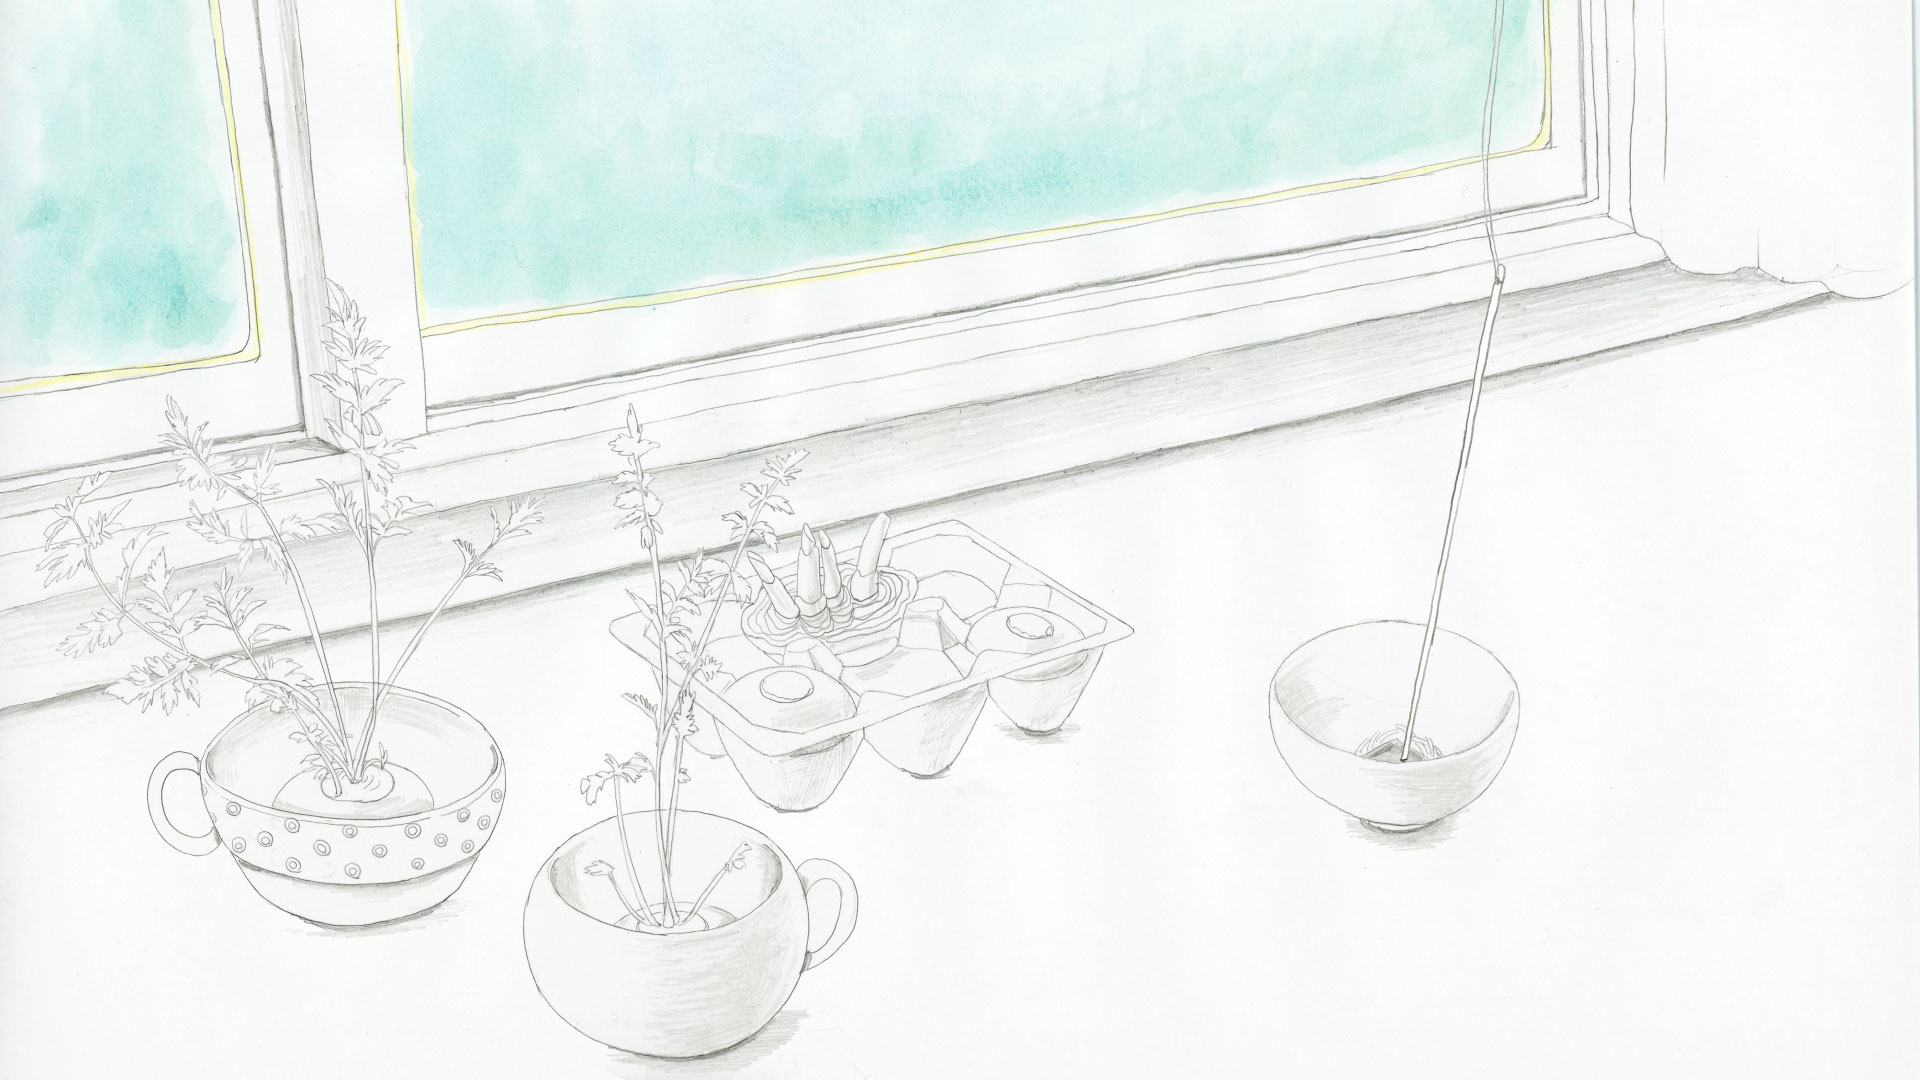 過去作品公開:「微睡みの終末」/ 梁 佳緒里